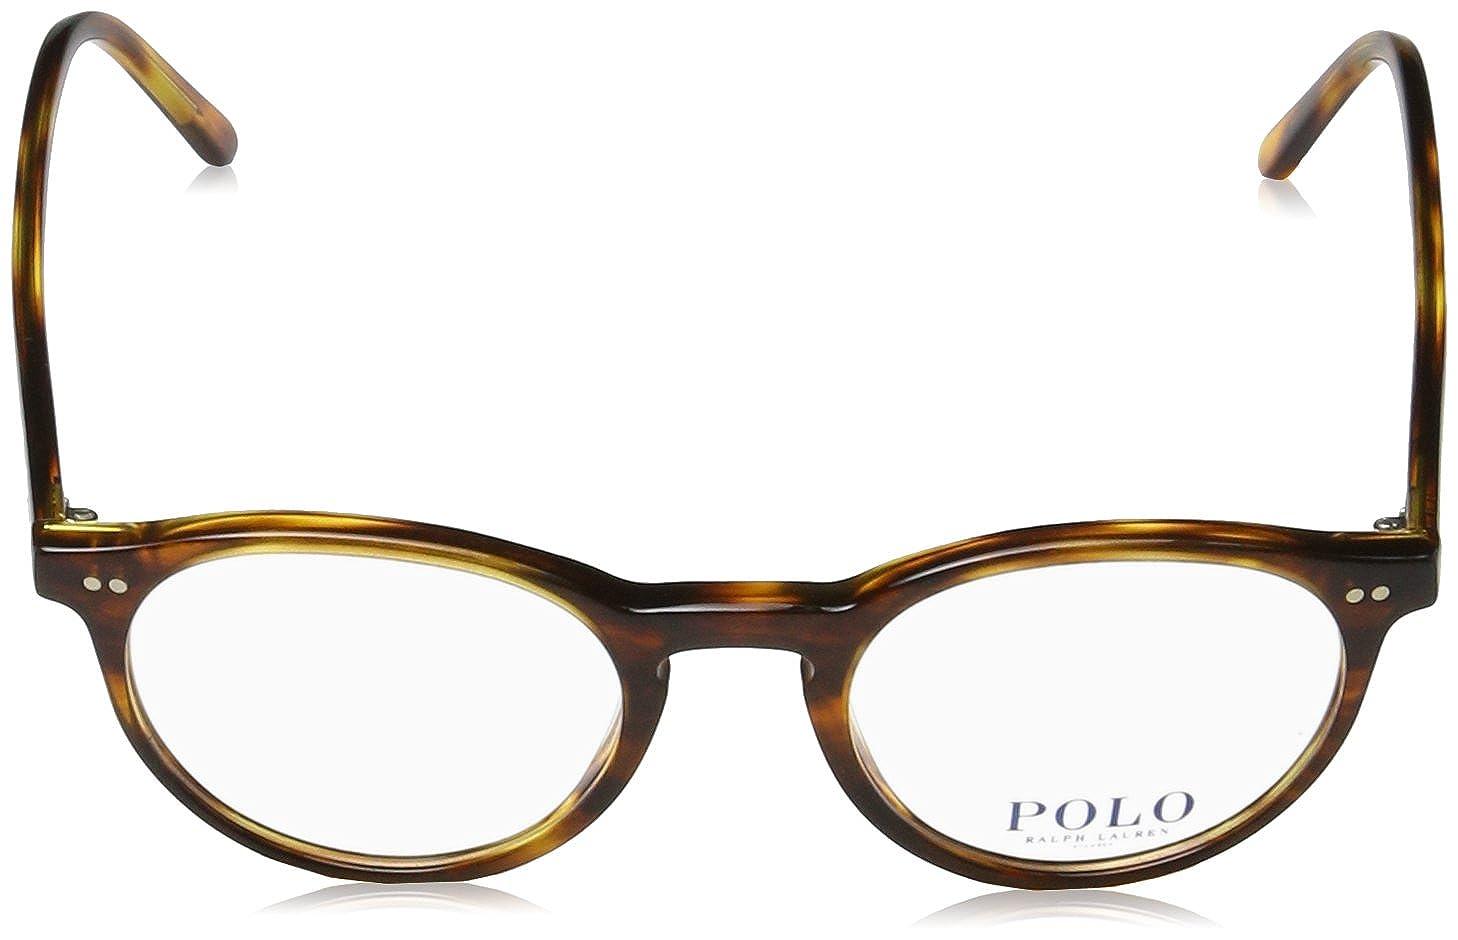 Polo Men's Havana 48mm Ph2083 Eyeglasses Striped kNwP80XnO